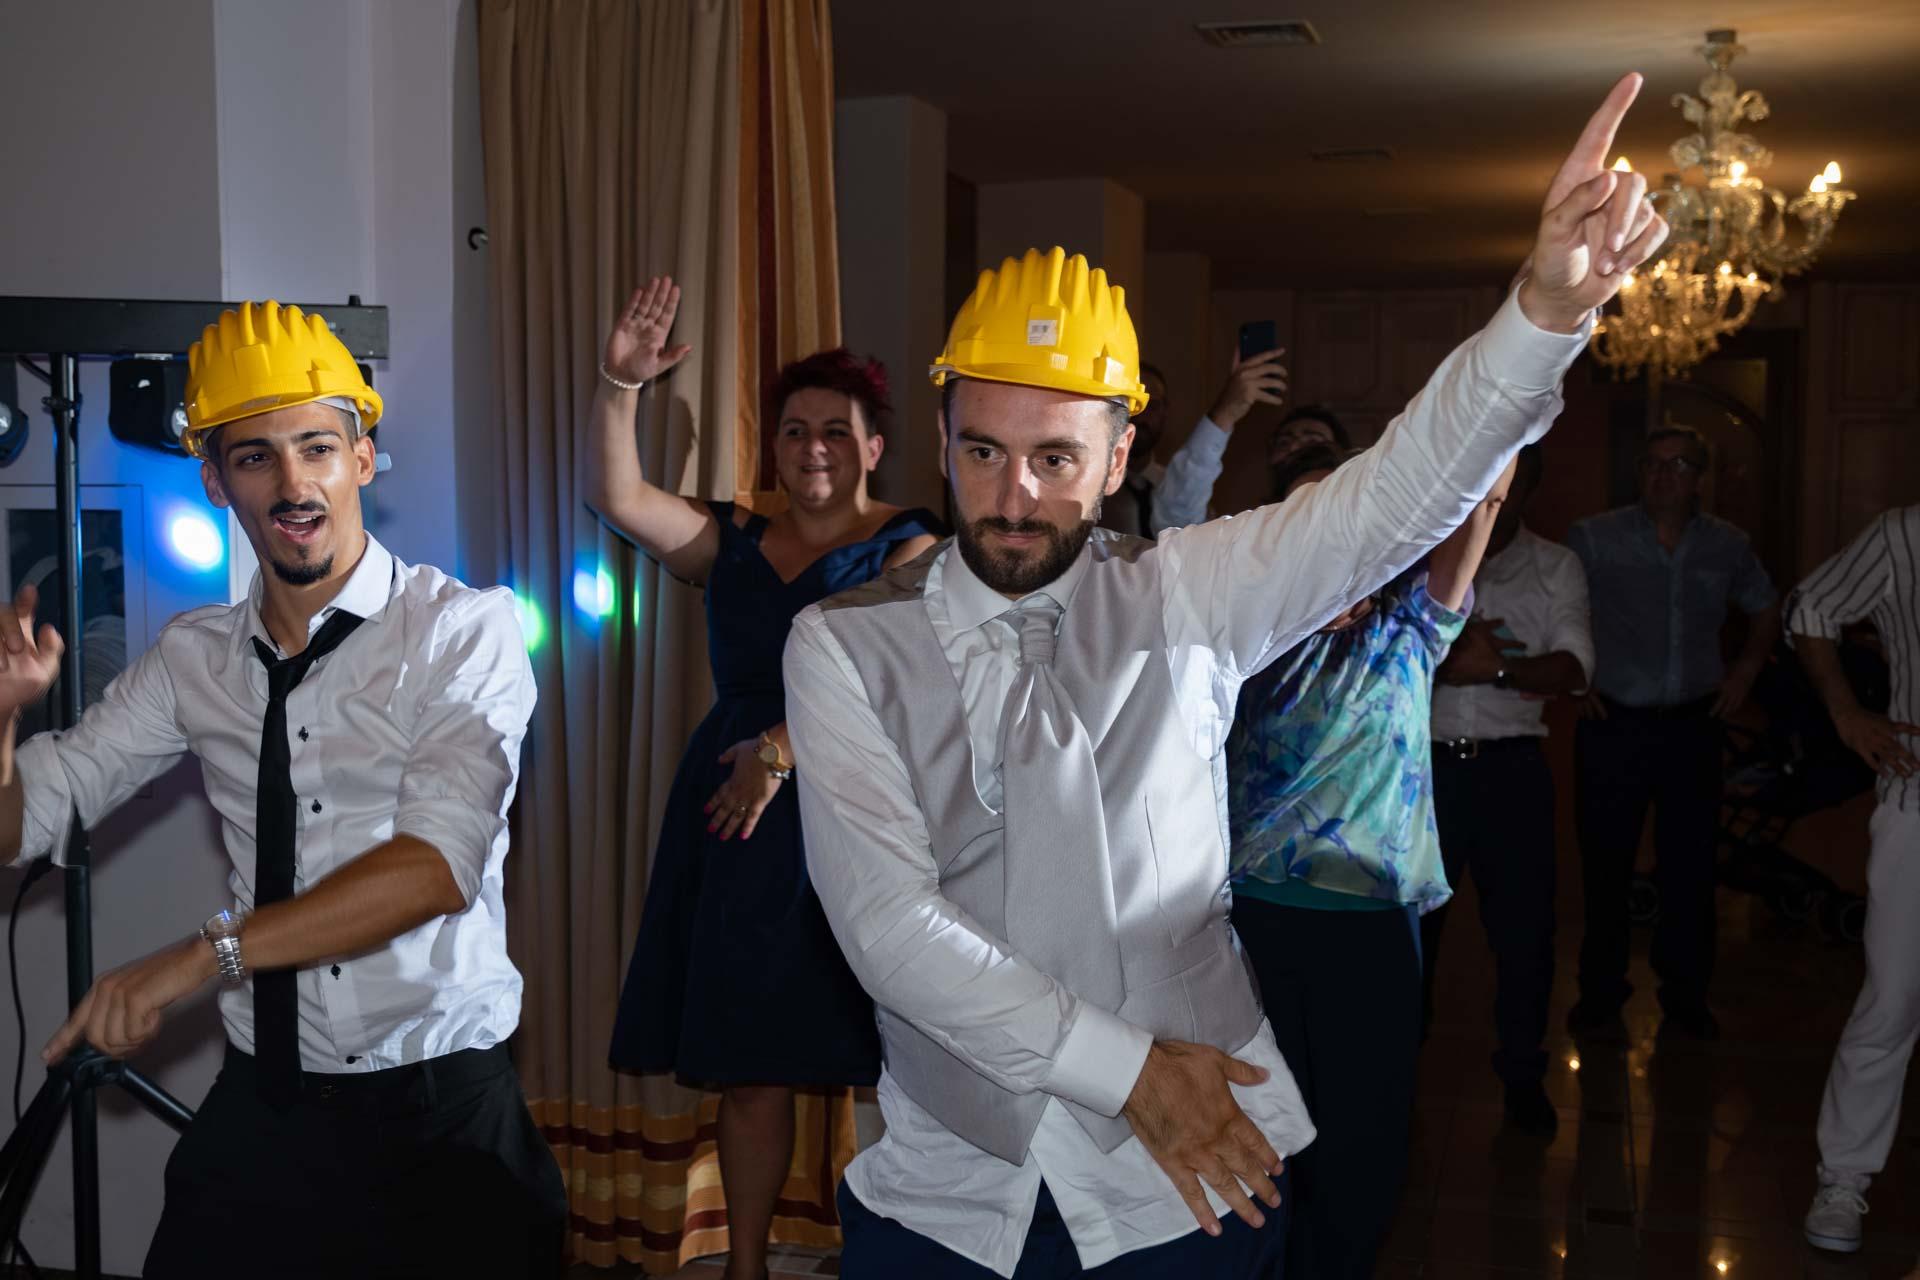 matrimonio ricevimento balli invitati